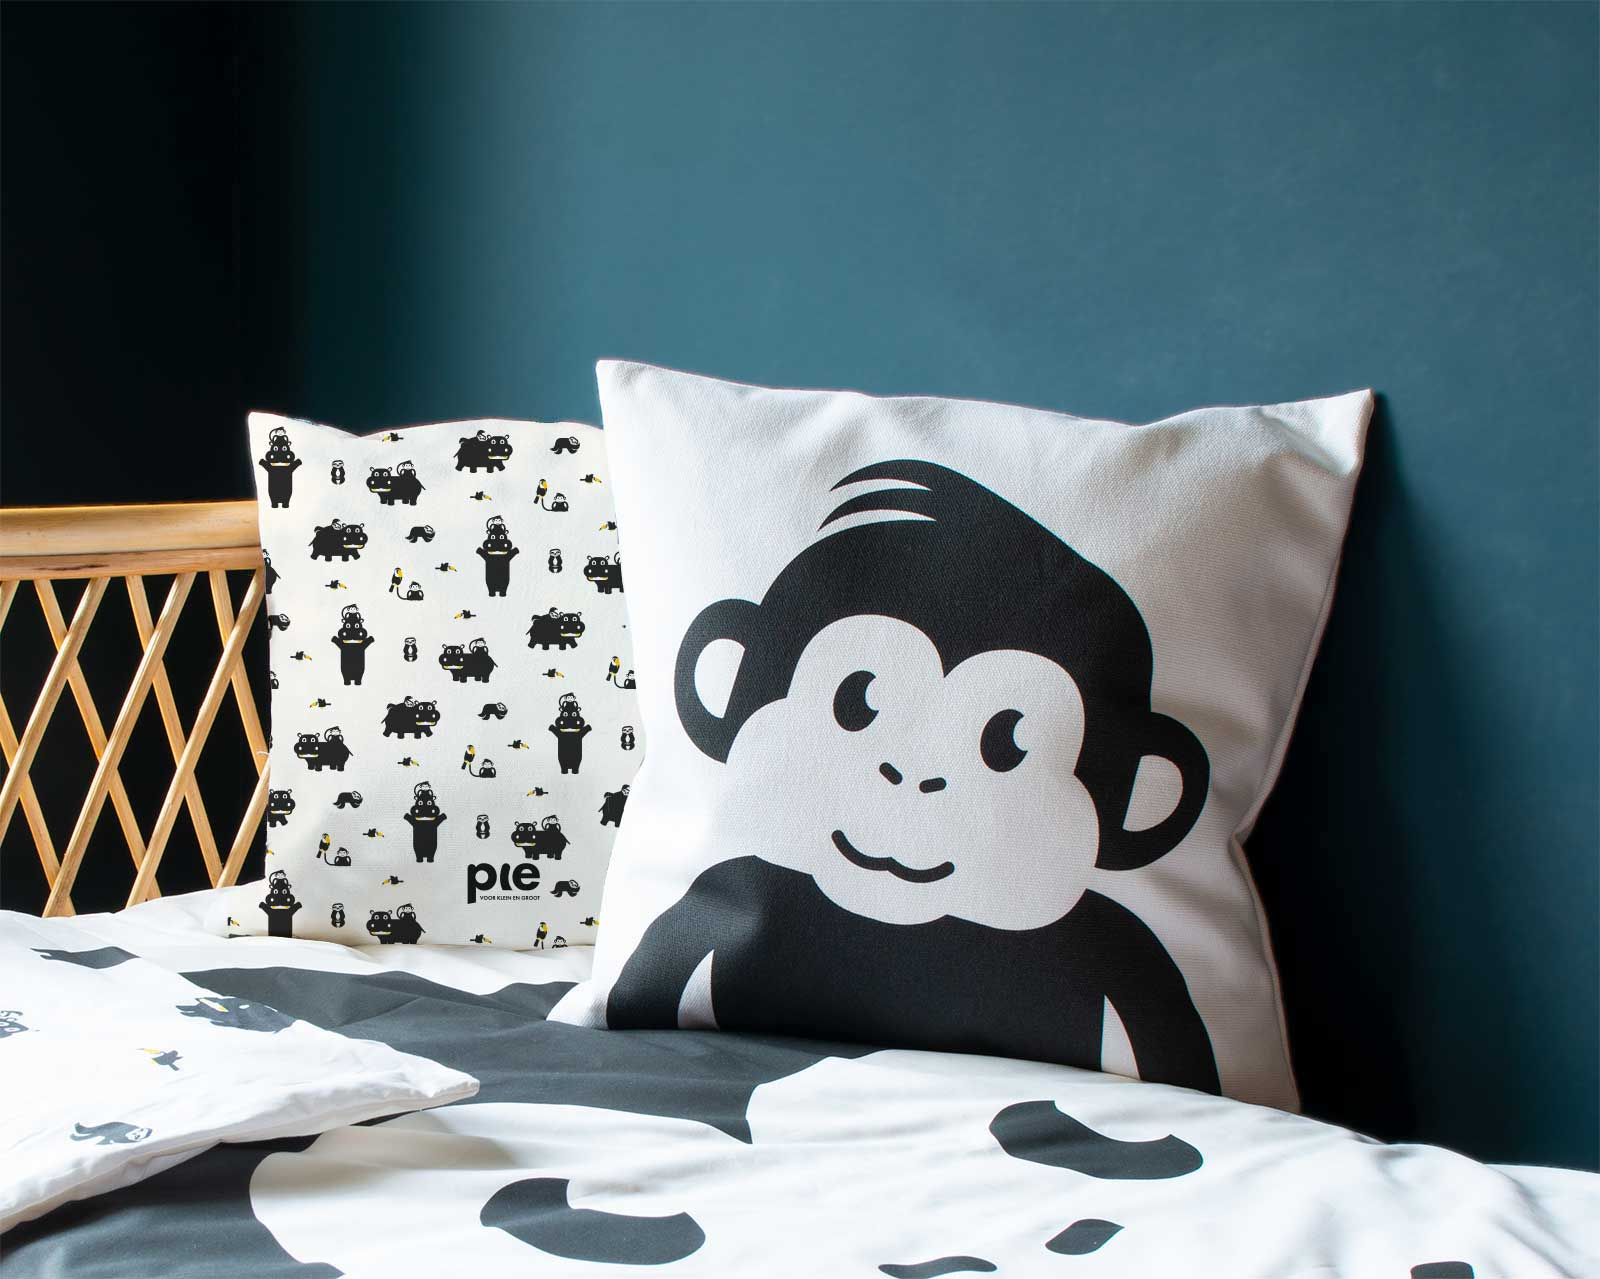 Kussenhoes kinderkamer zwart-wit print aapje Pie Mono zwart wit print 40x40 cm